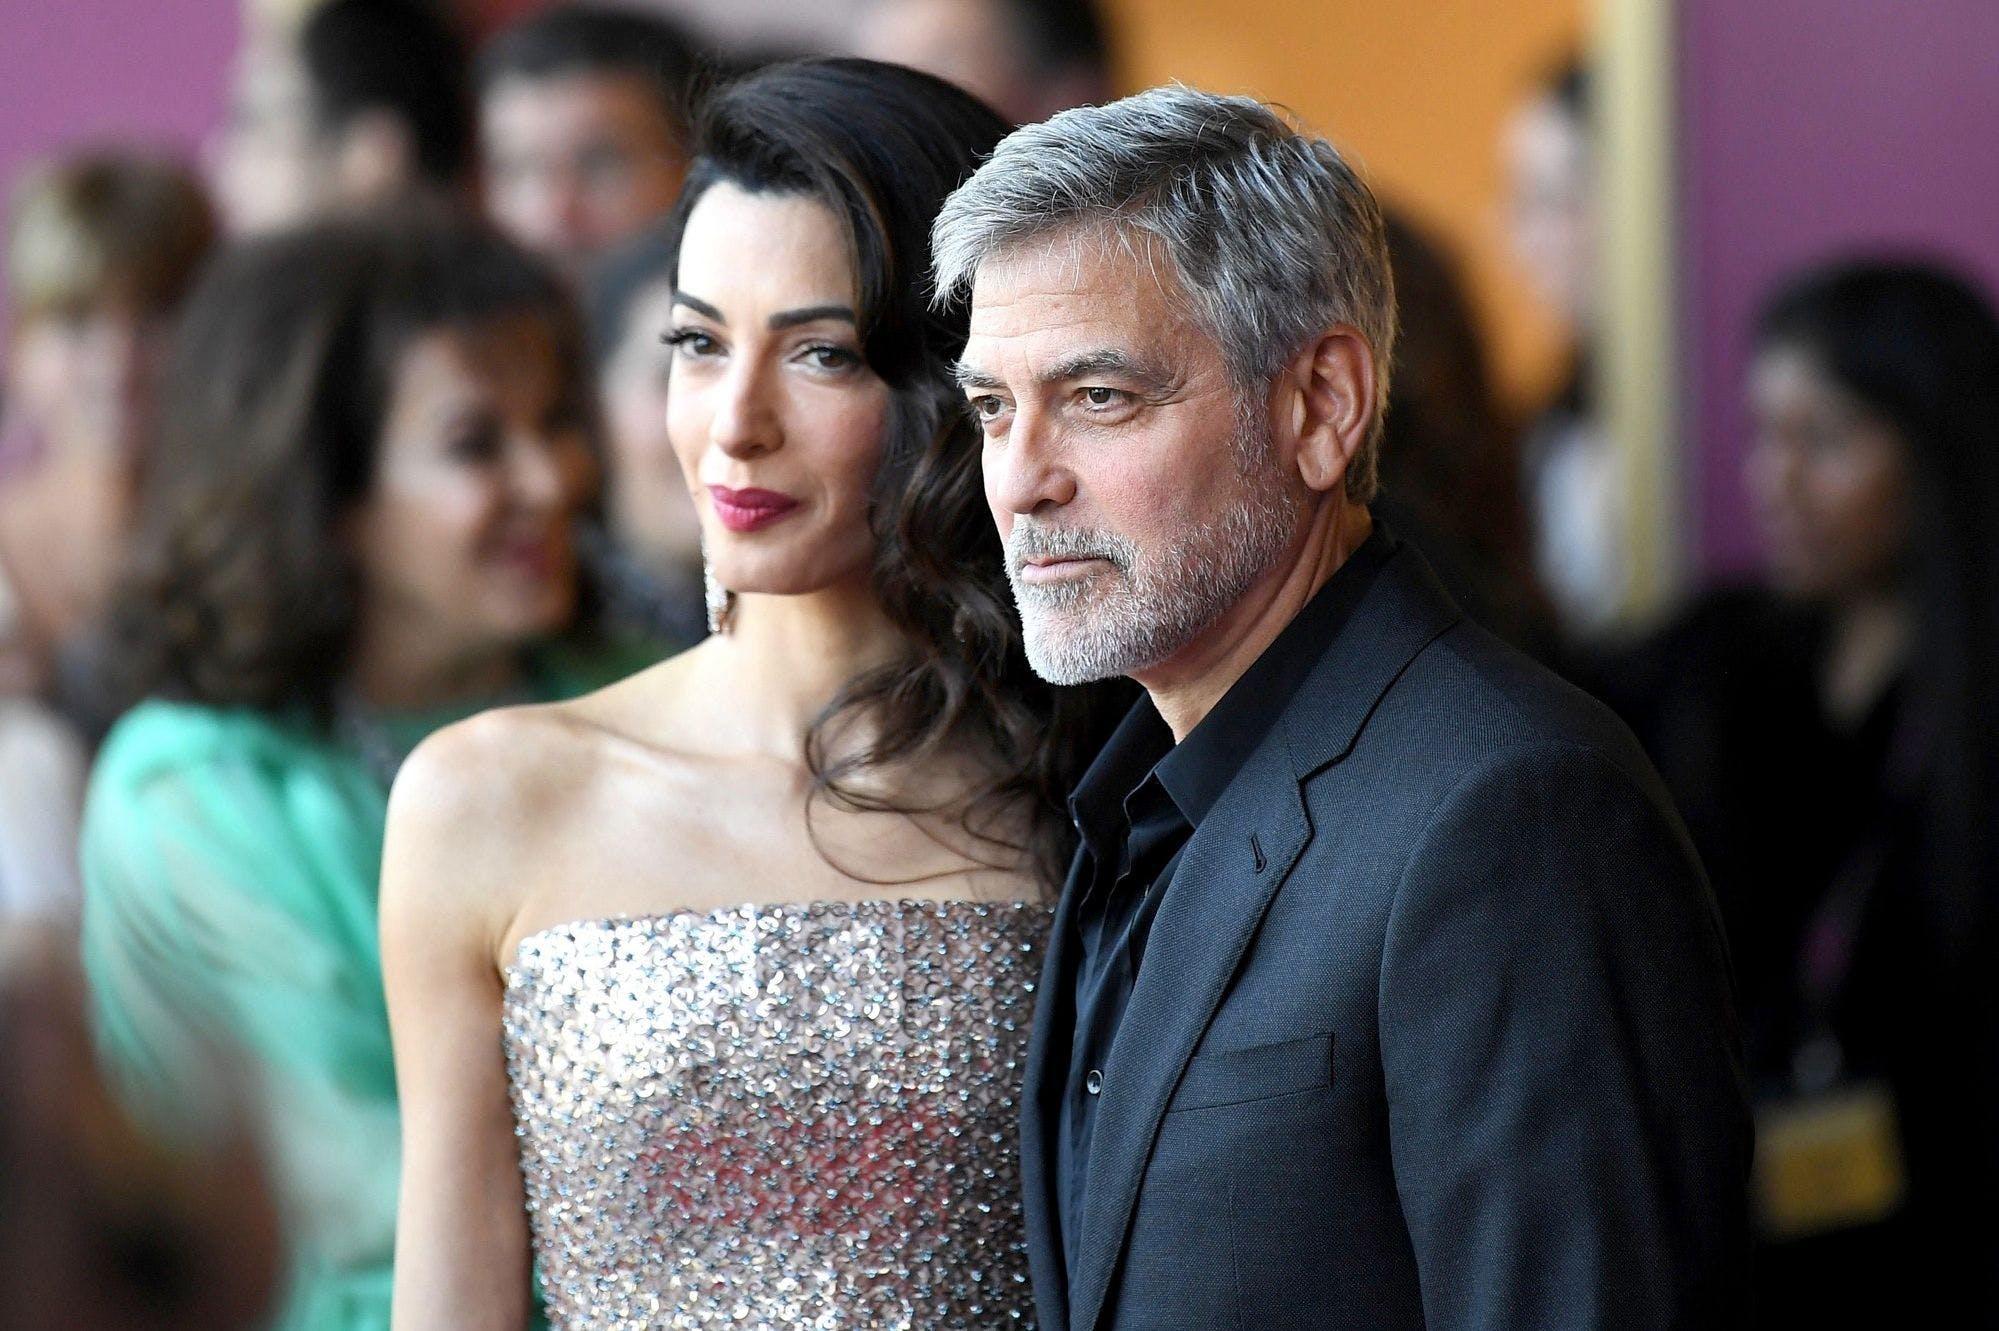 George Clooney: AFI Lifetime Achievement Award